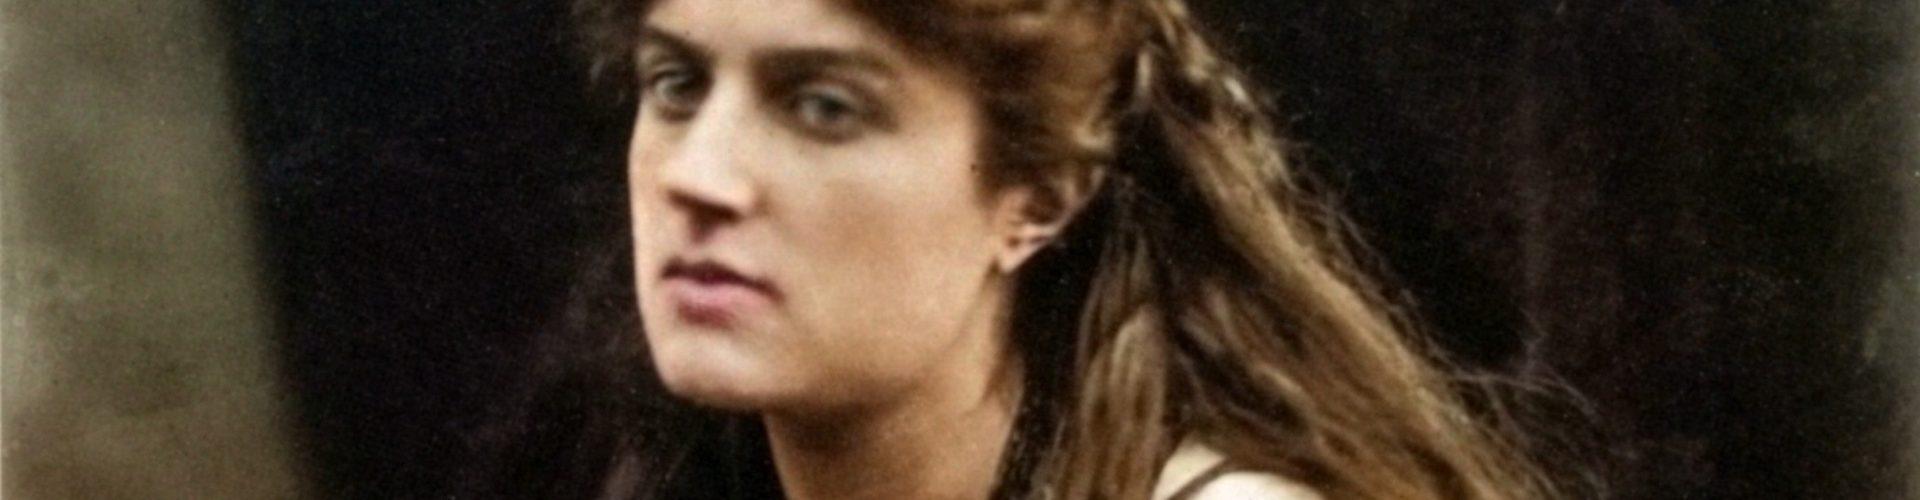 Marie Spartal jako Hypatia (J.M. Cameron/domena publiczna)